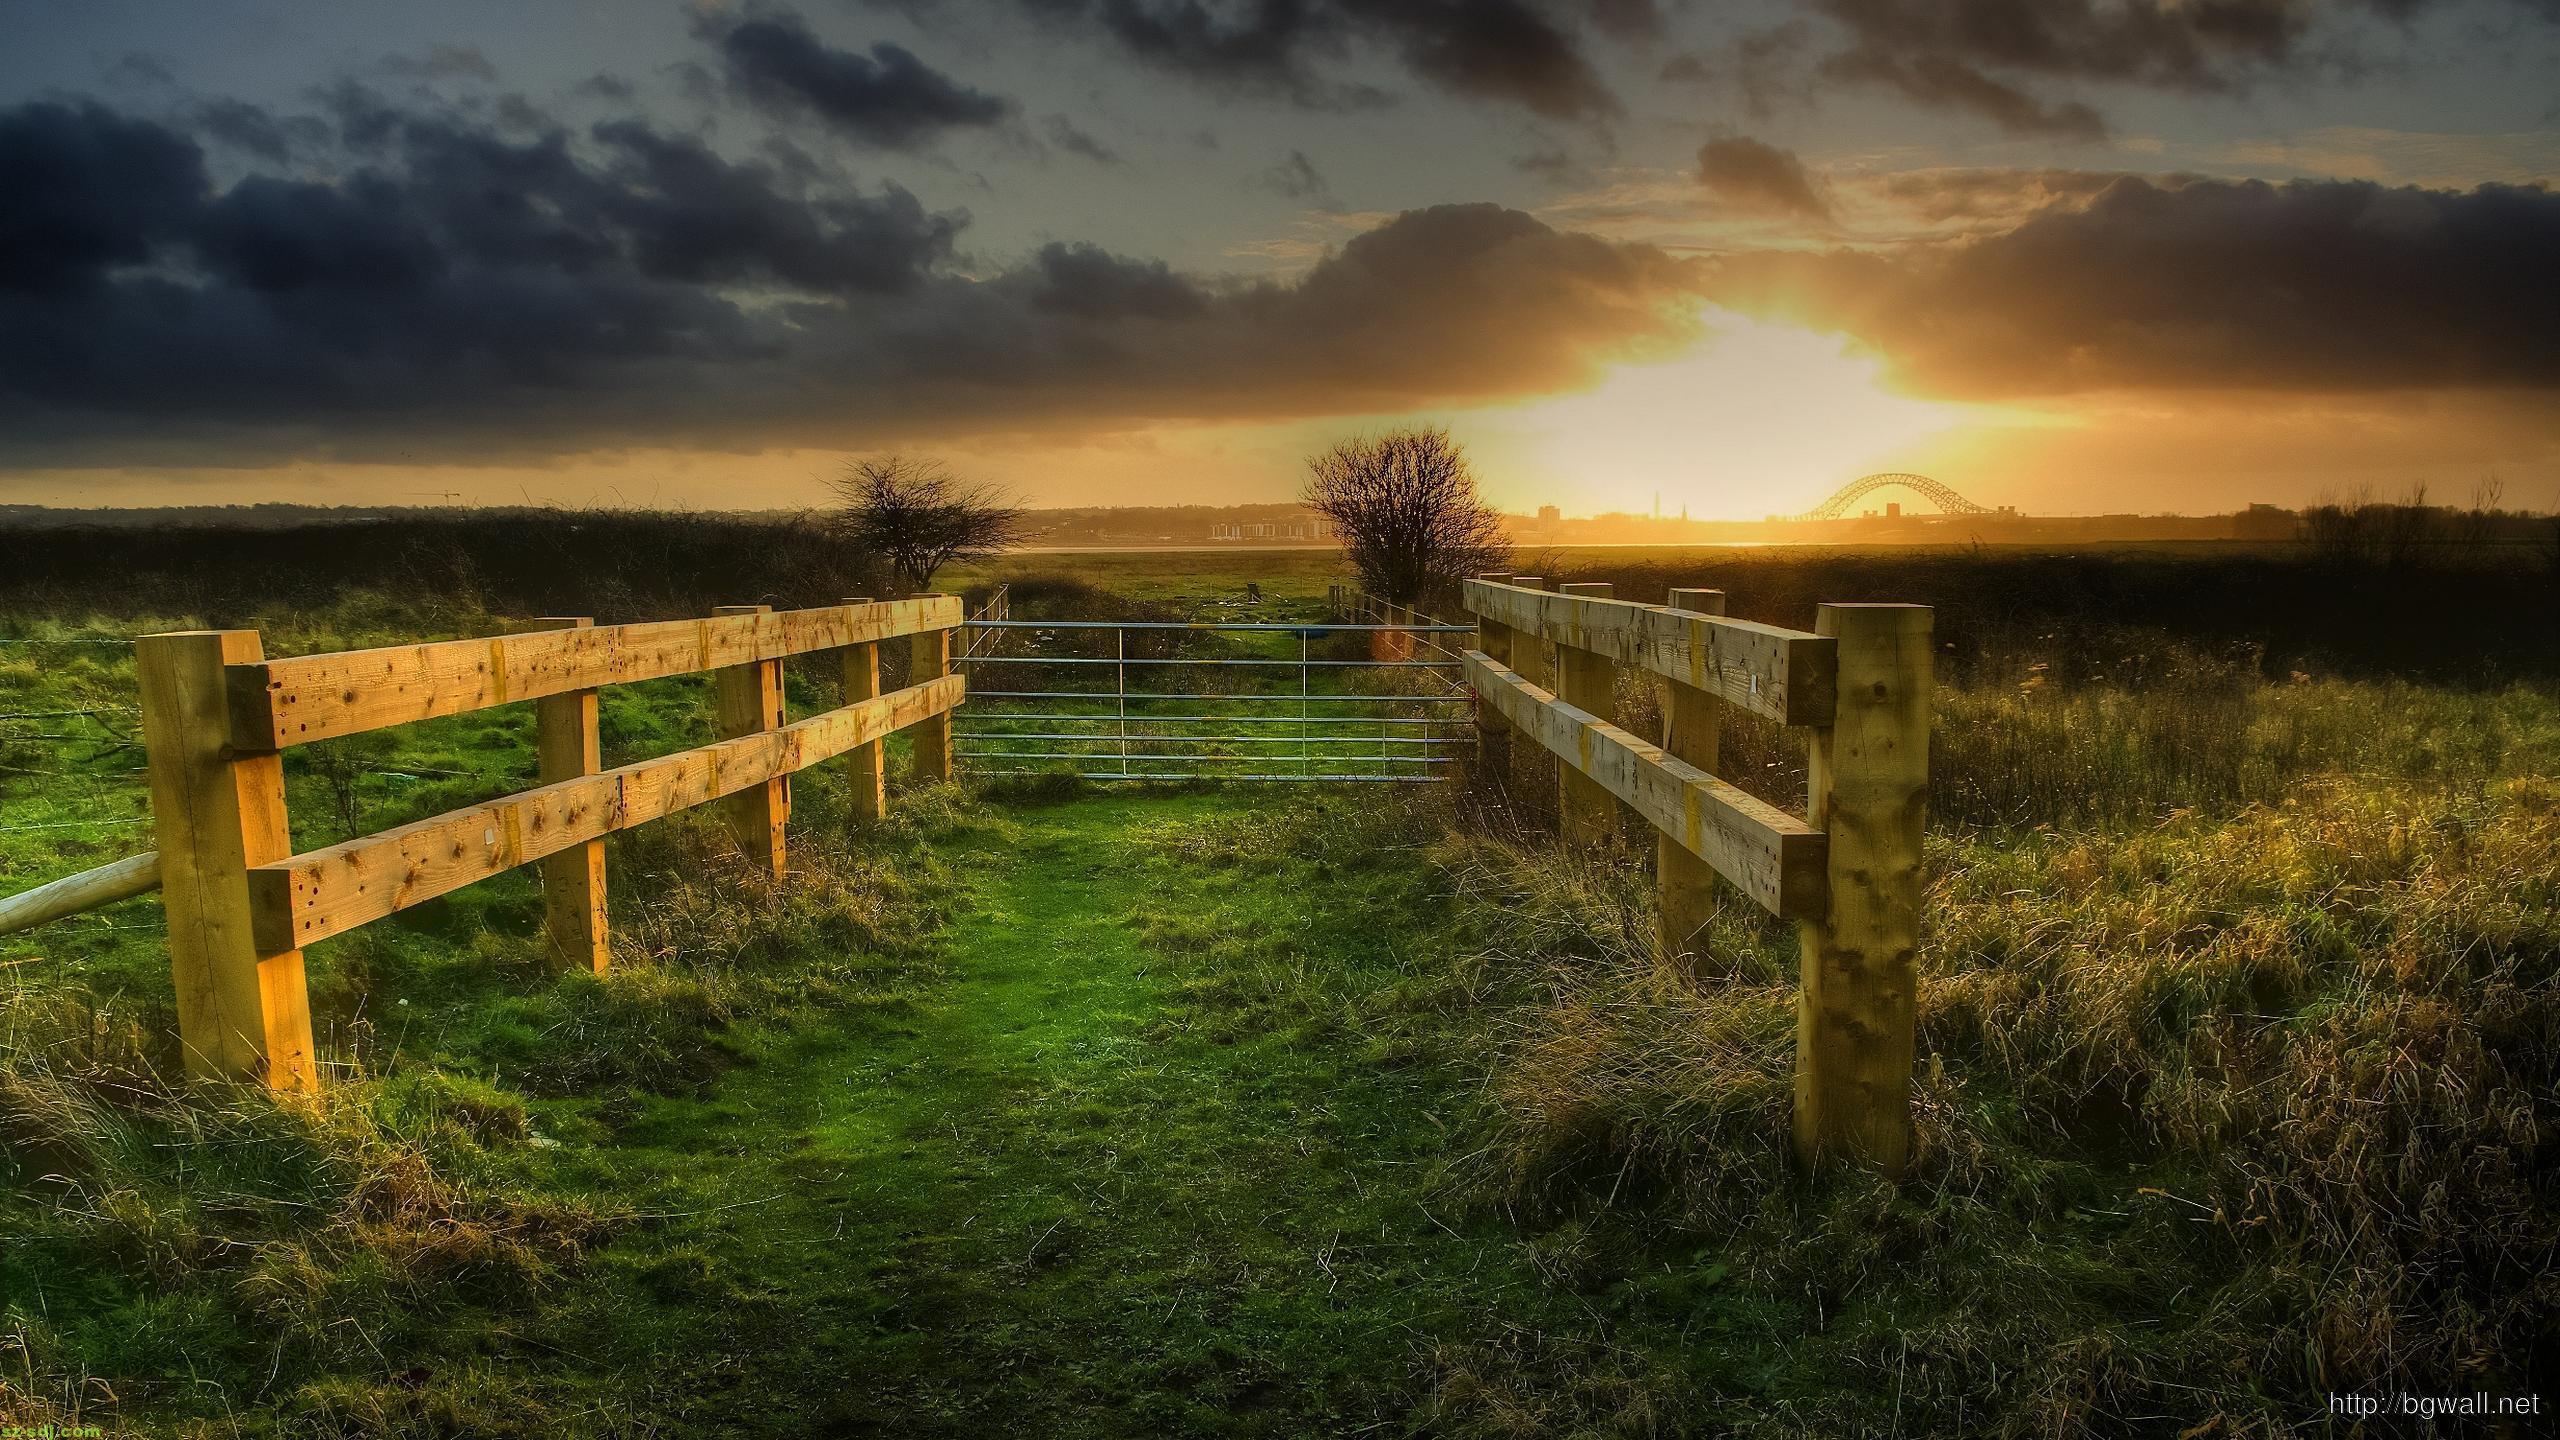 fencing-sunset-nature-wallpaper-widescreen